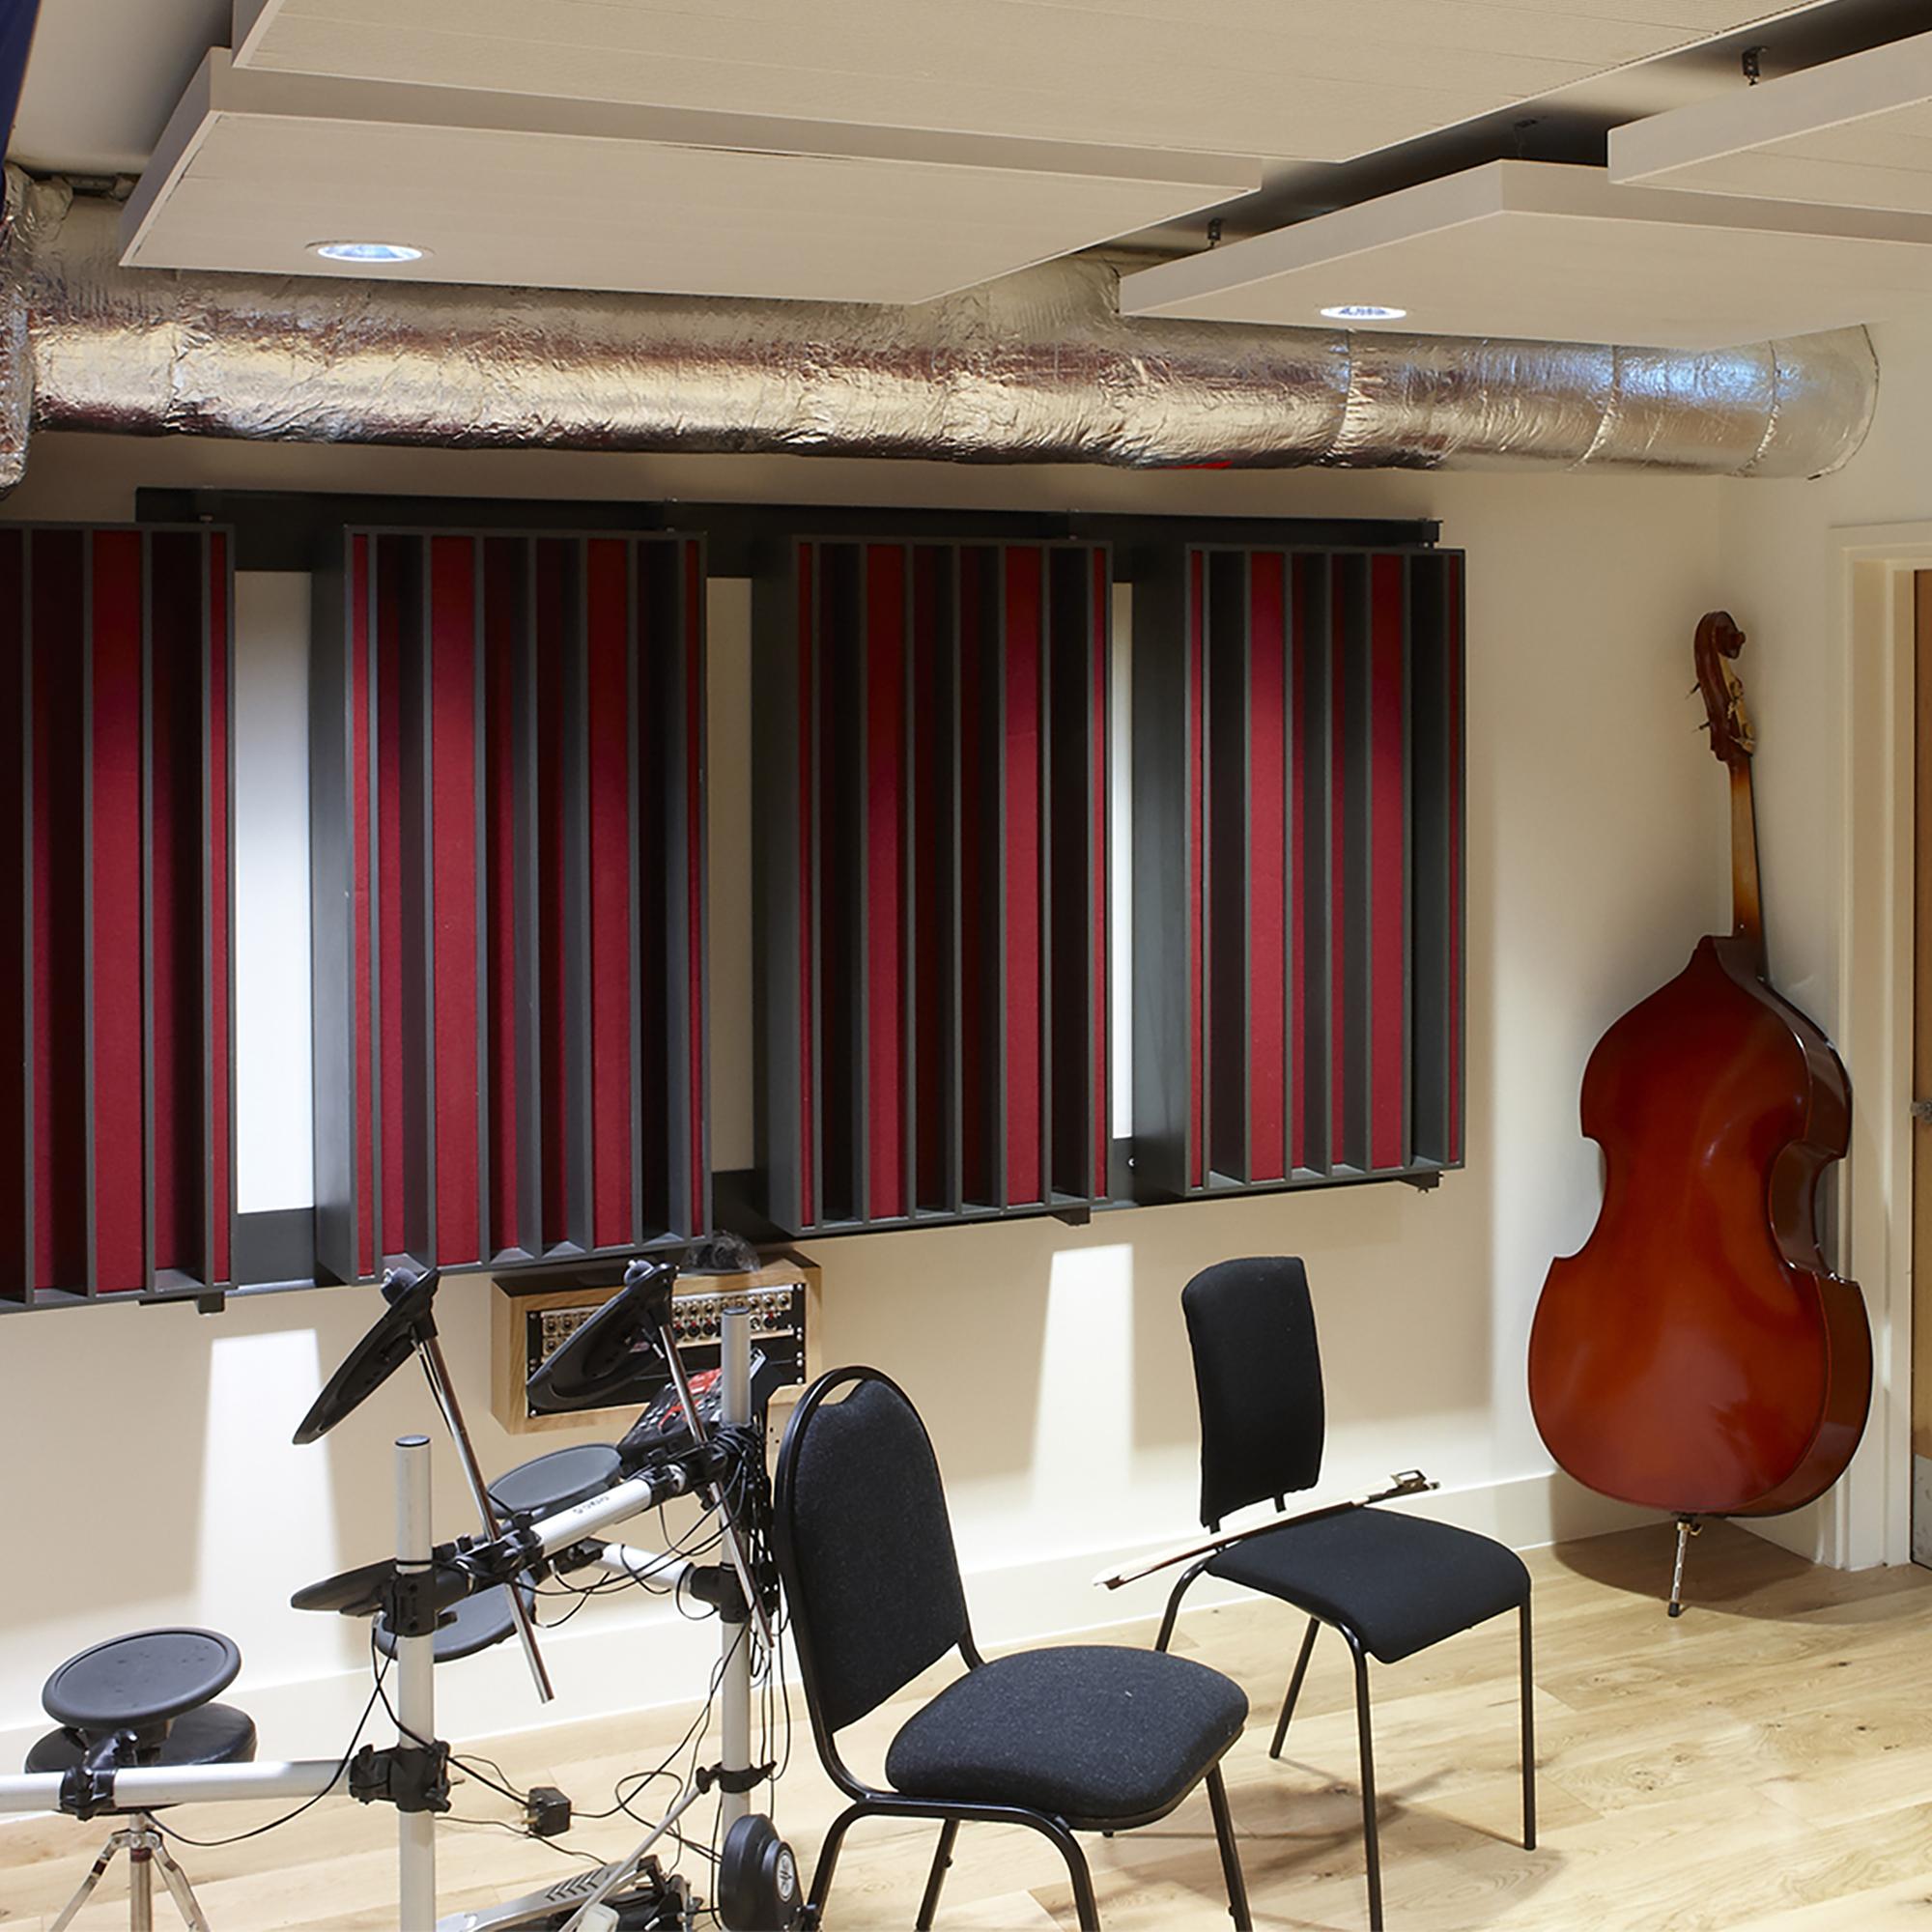 R&W Sound audio recording Installation